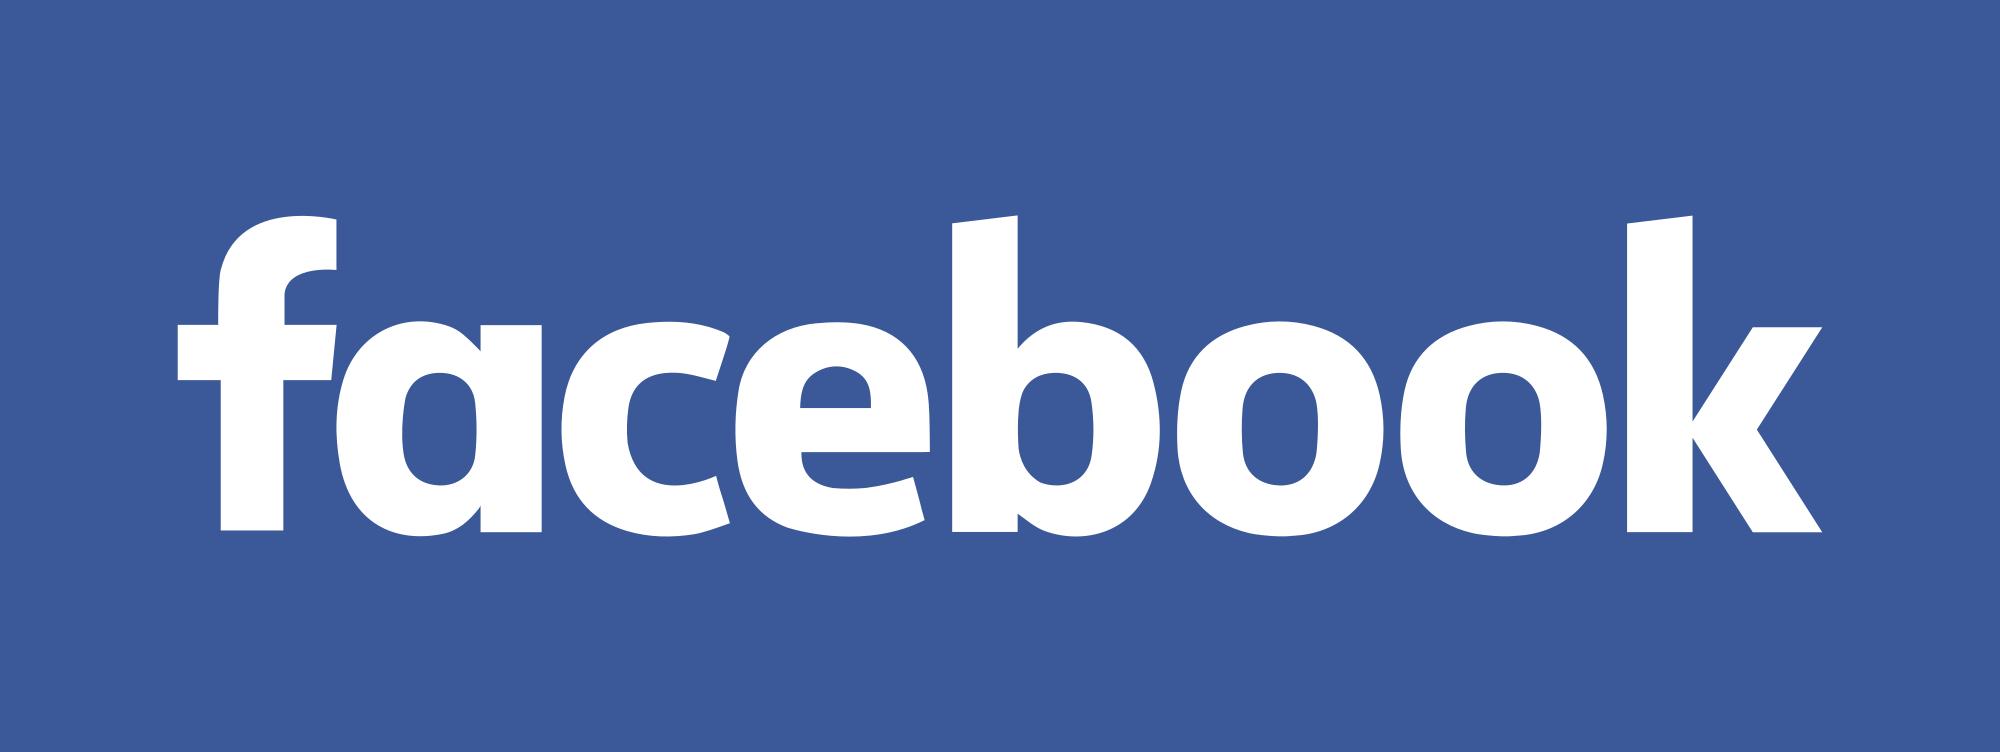 [Hot Post] ফেসবুক আইডির (Profile) নাম লিখুন ইংরেজিতে সবগুলো বড় হাতের অক্ষর দিয়ে কোন এপ ছাড়া।[Android+Java+Symbian+Pc]